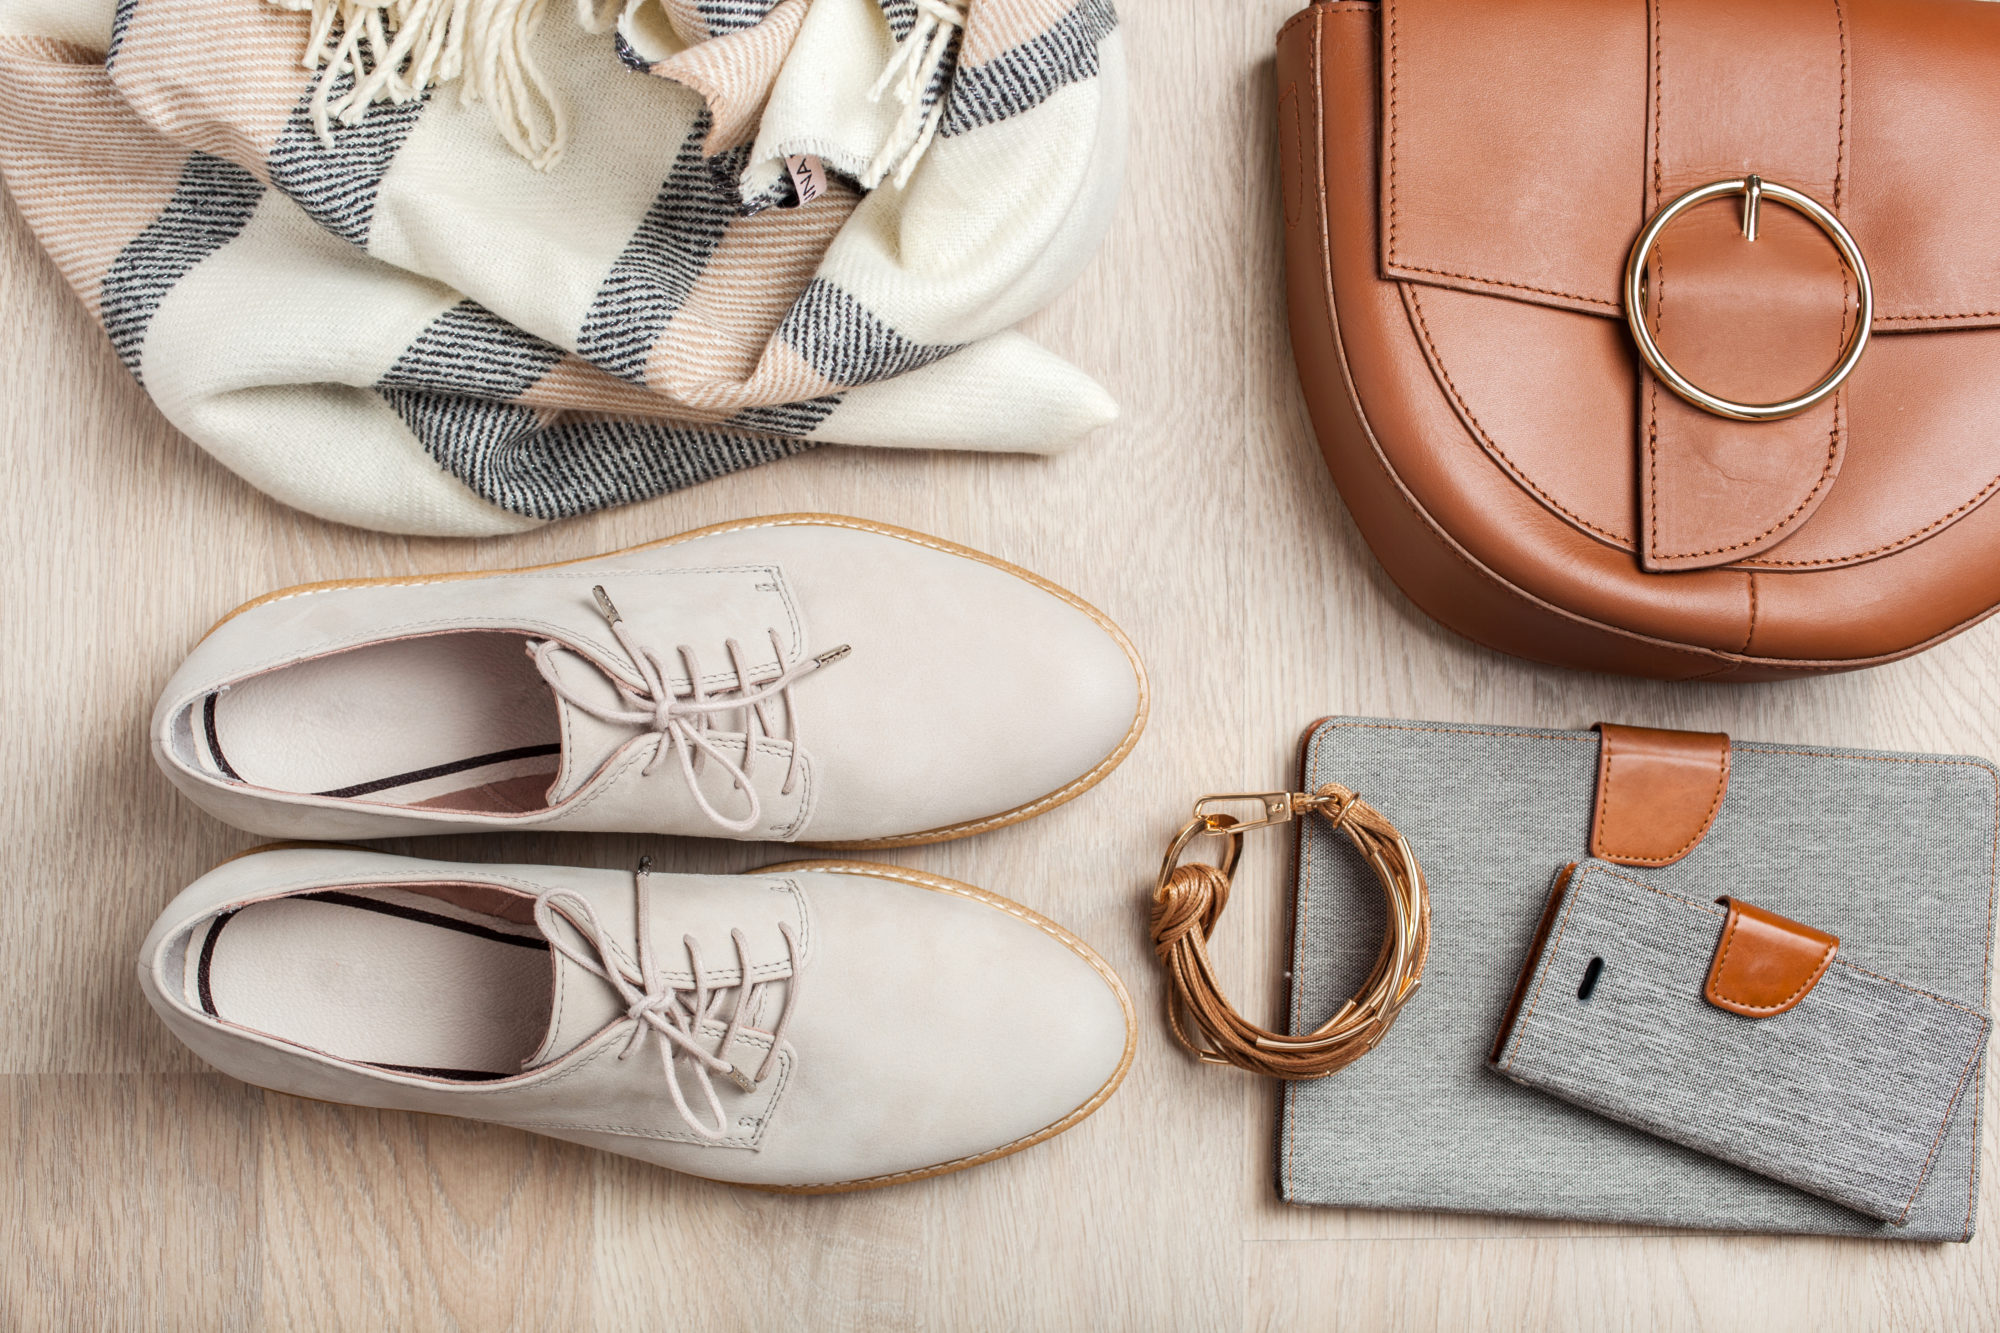 women's flat lay clothes shoes, scarf, bracelet, bag, tablet, smartlphone. Fashion blog, clothing, shopping